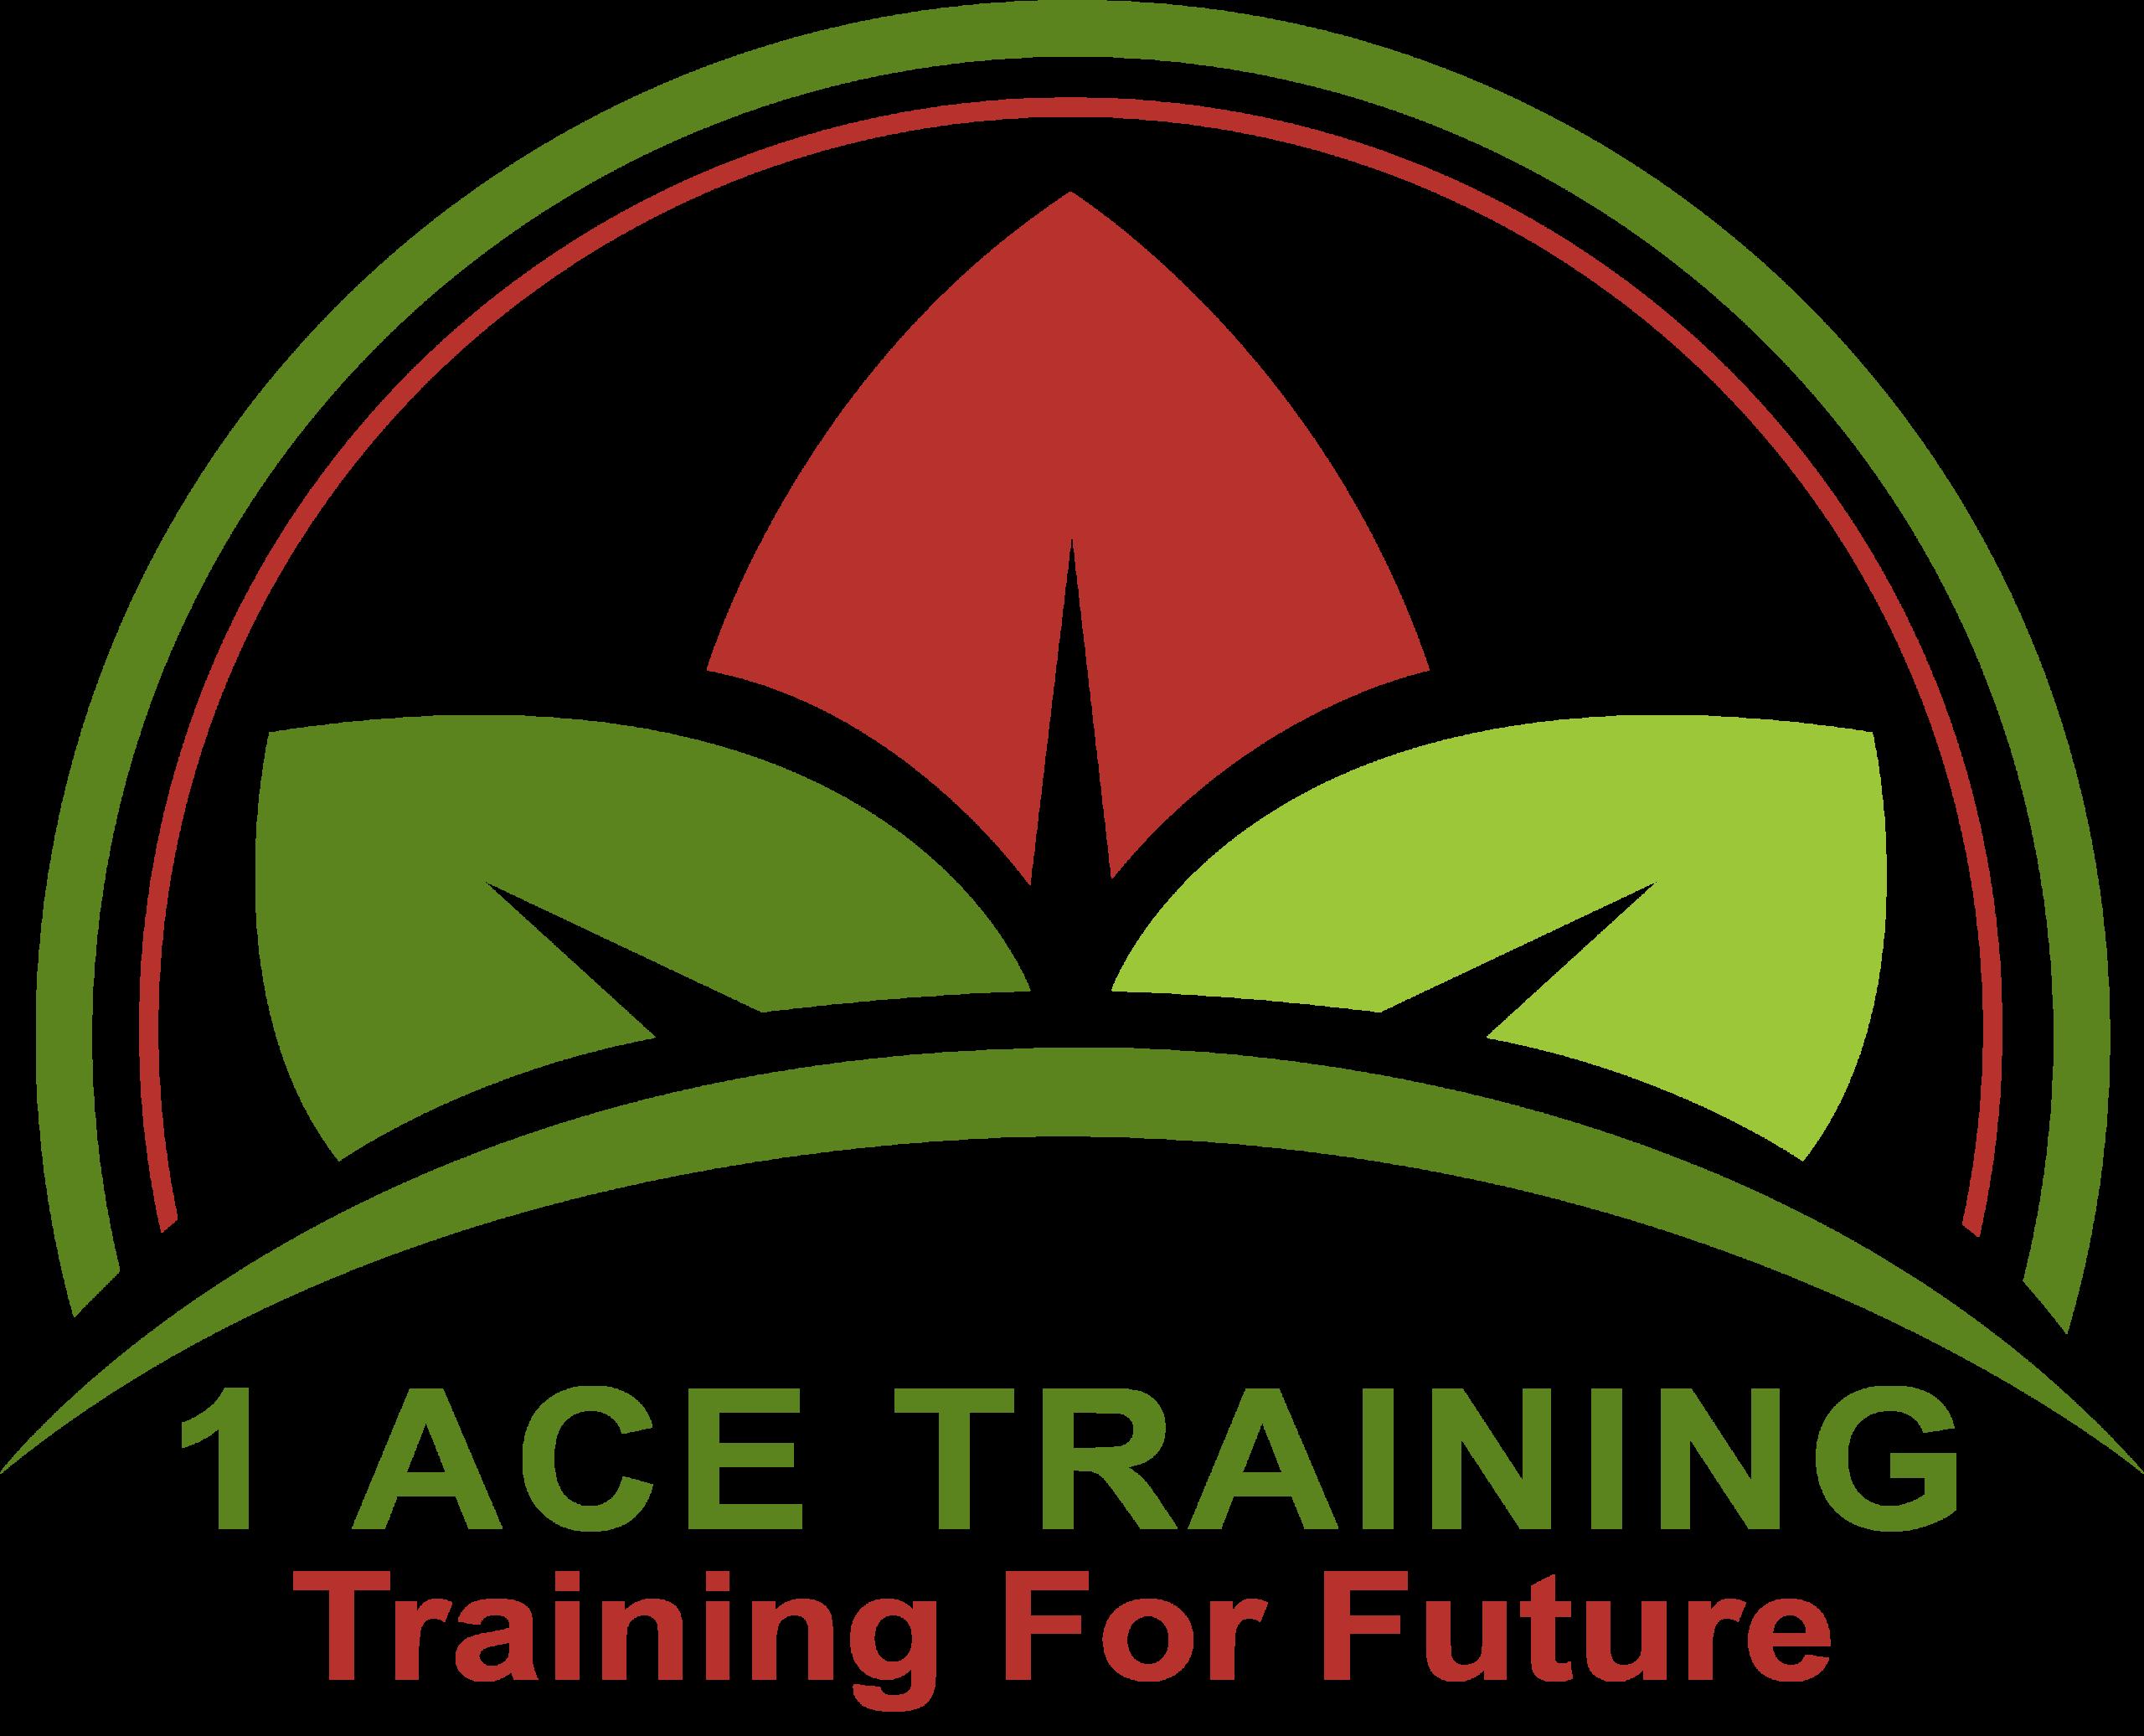 1Ace Training